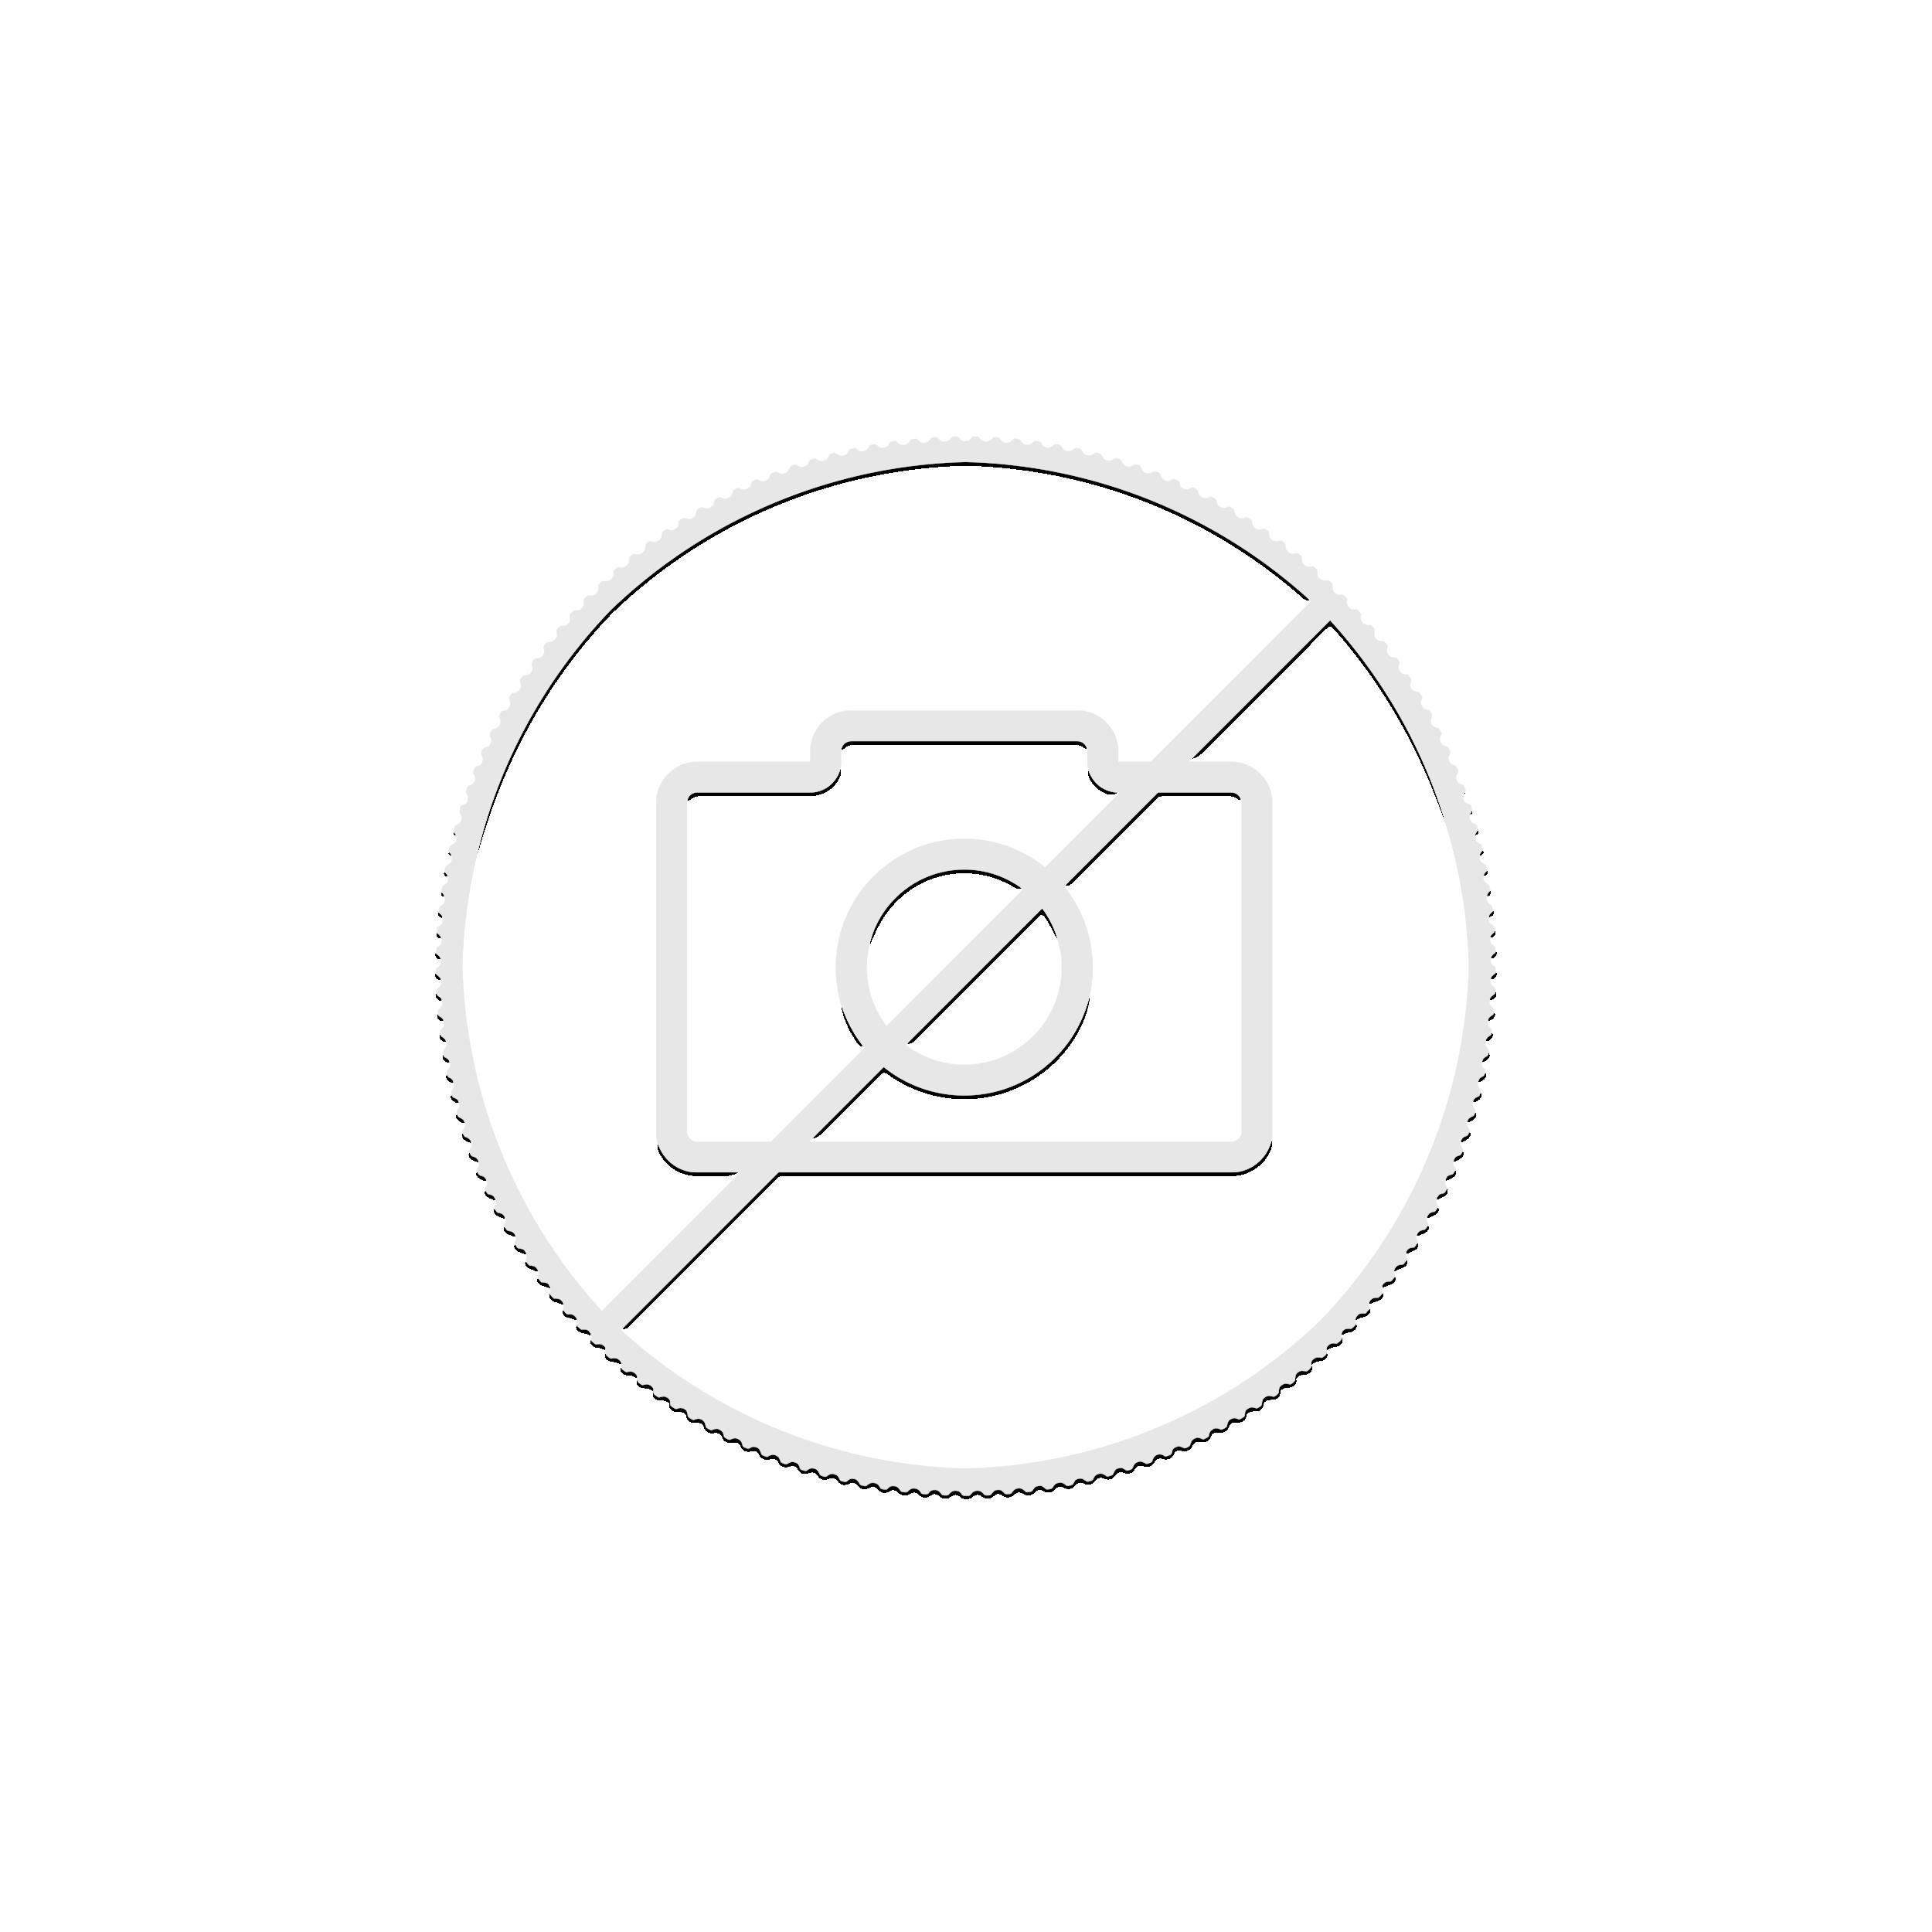 1 Troy ounce zilveren munt Moose 2012